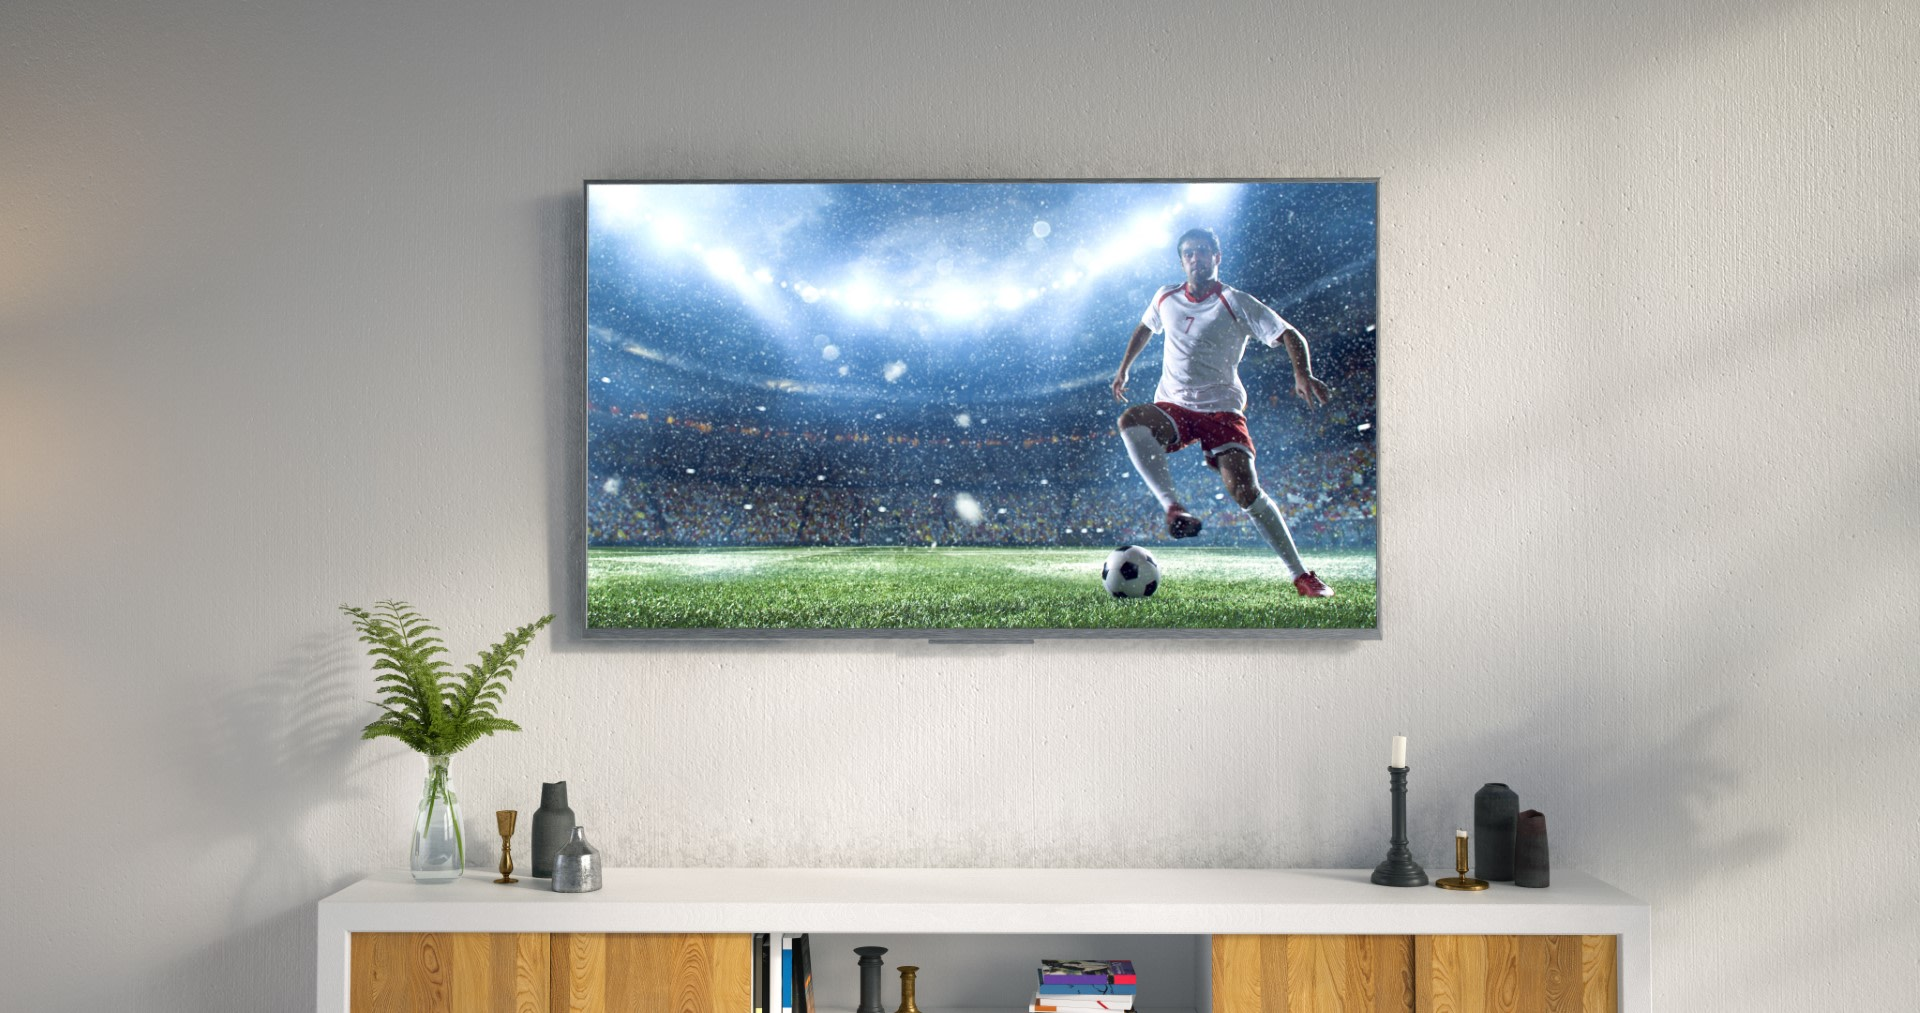 An image related to Best Sharp Roku Smart TVs